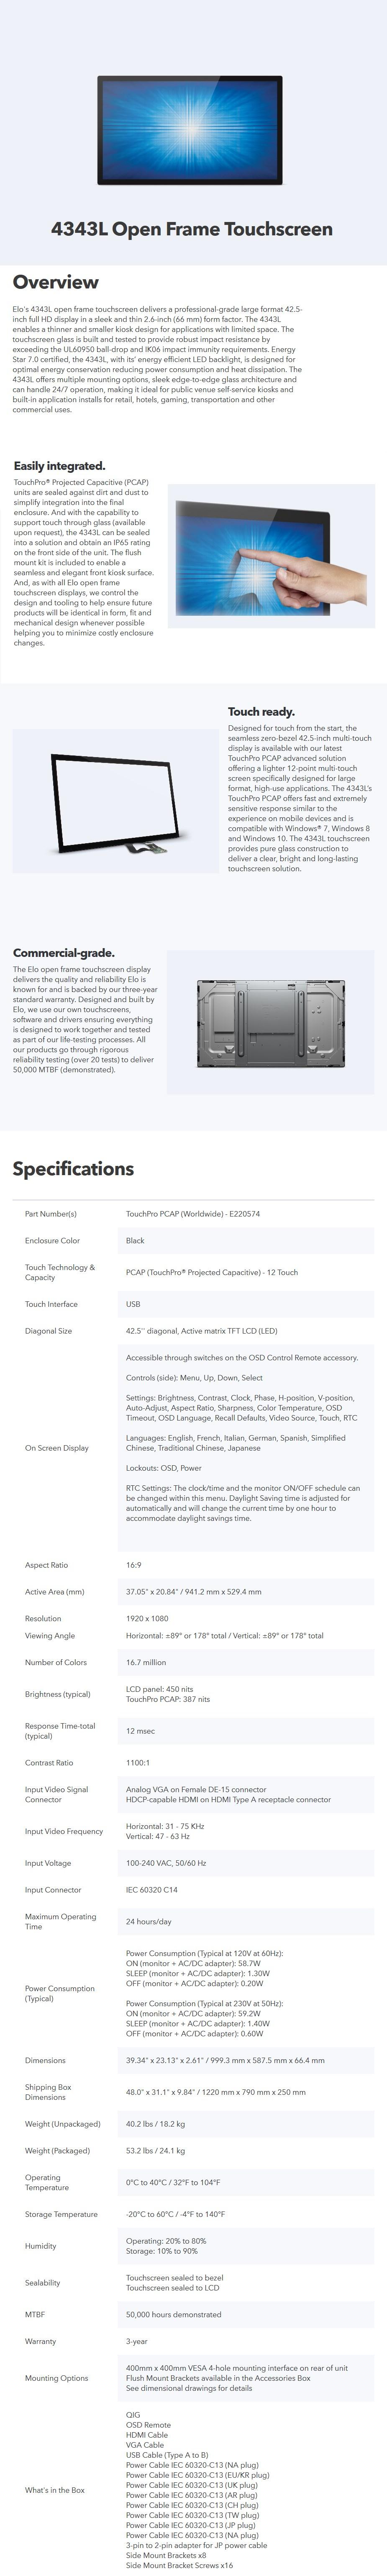 "Elo 4343L 43"" Open Frame Full HD Touchscreen POS Monitor - Desktop Overview 1"